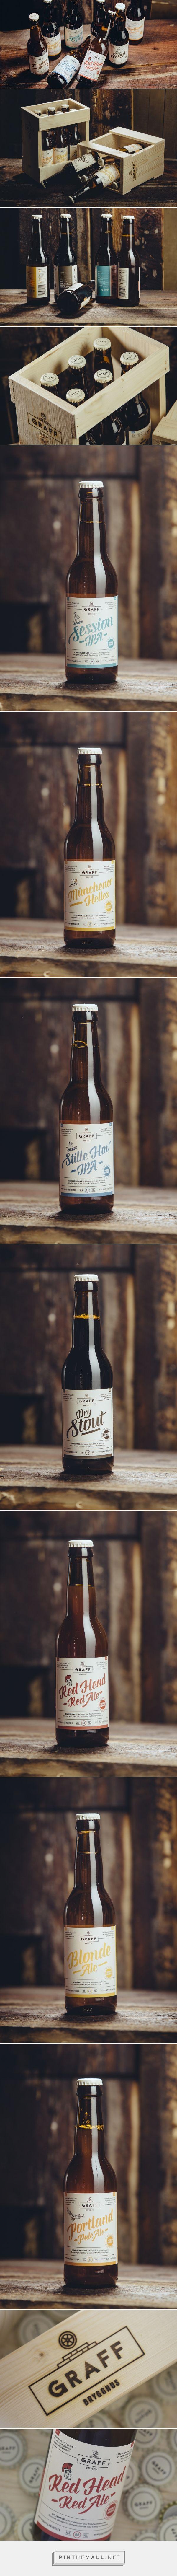 The Graff Beer design family — The Dieline - Branding & Packaging - created via http://pinthemall.net